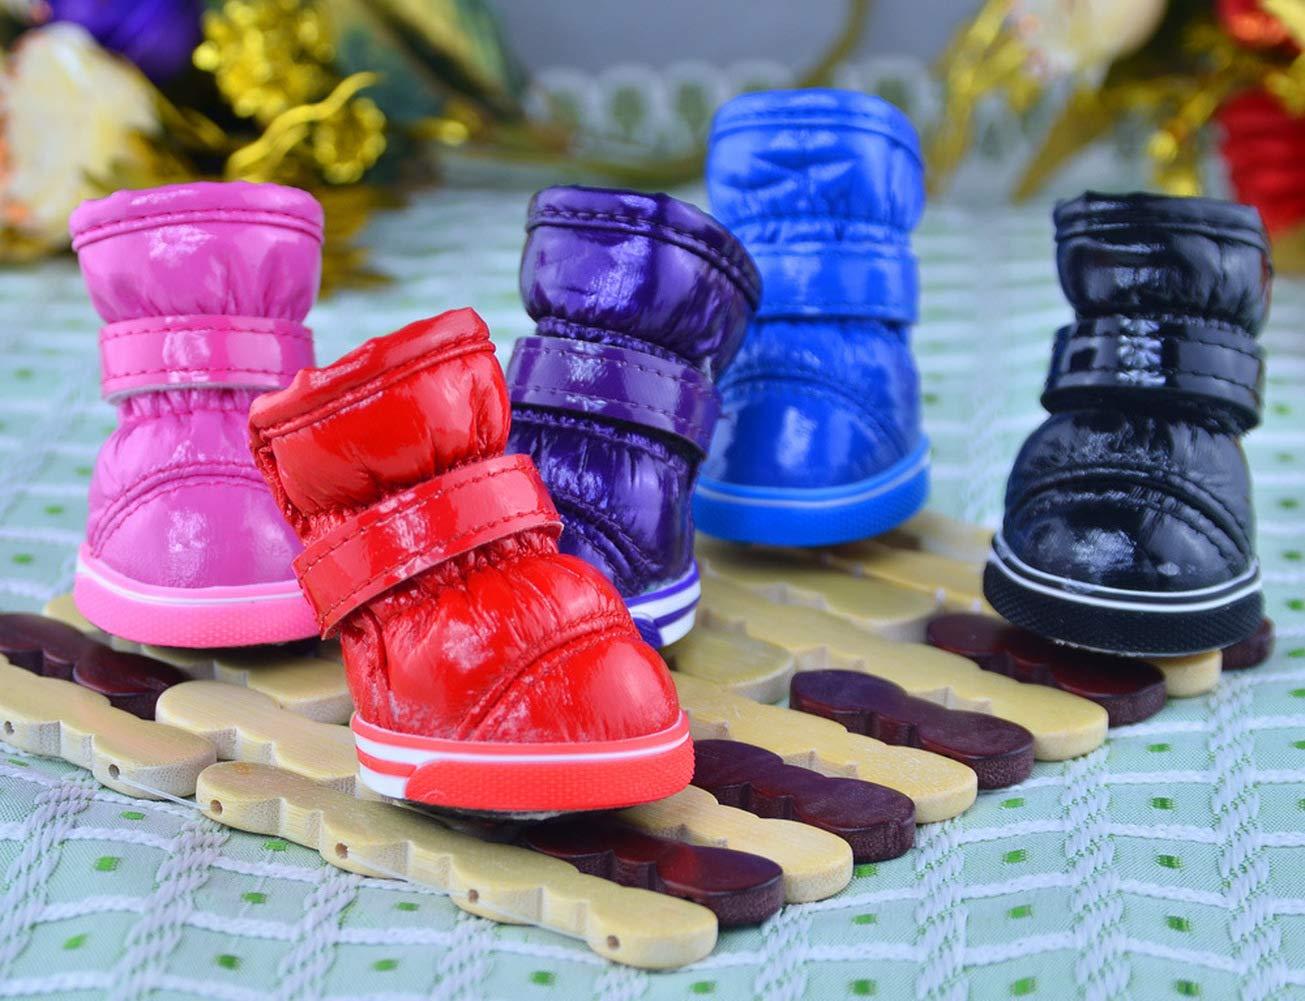 Yevison Cute Simple Dog Shoes Waterproof Non-Slip Pet Shoes